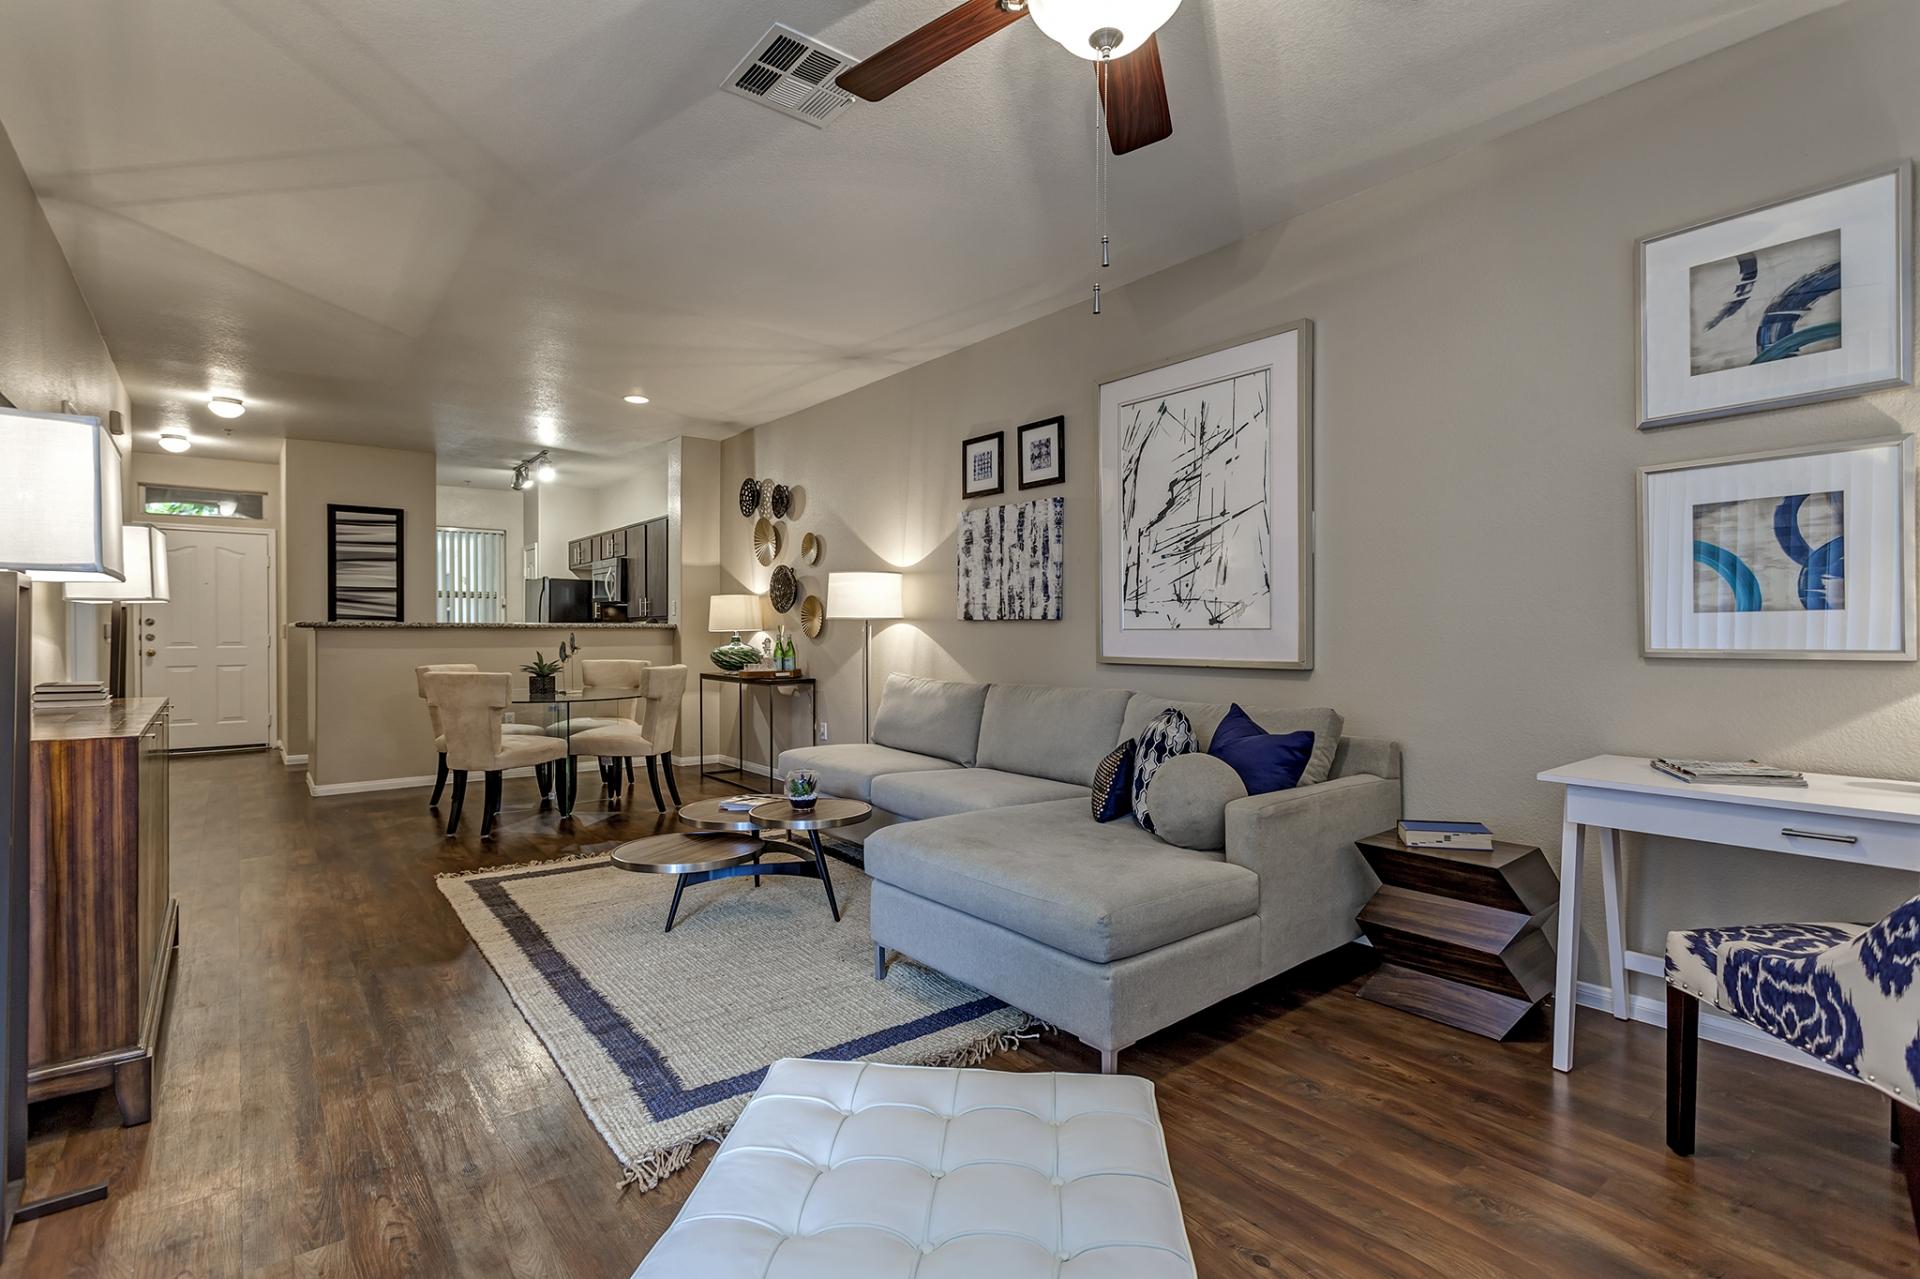 Camden Crown Valley Apartments image 4